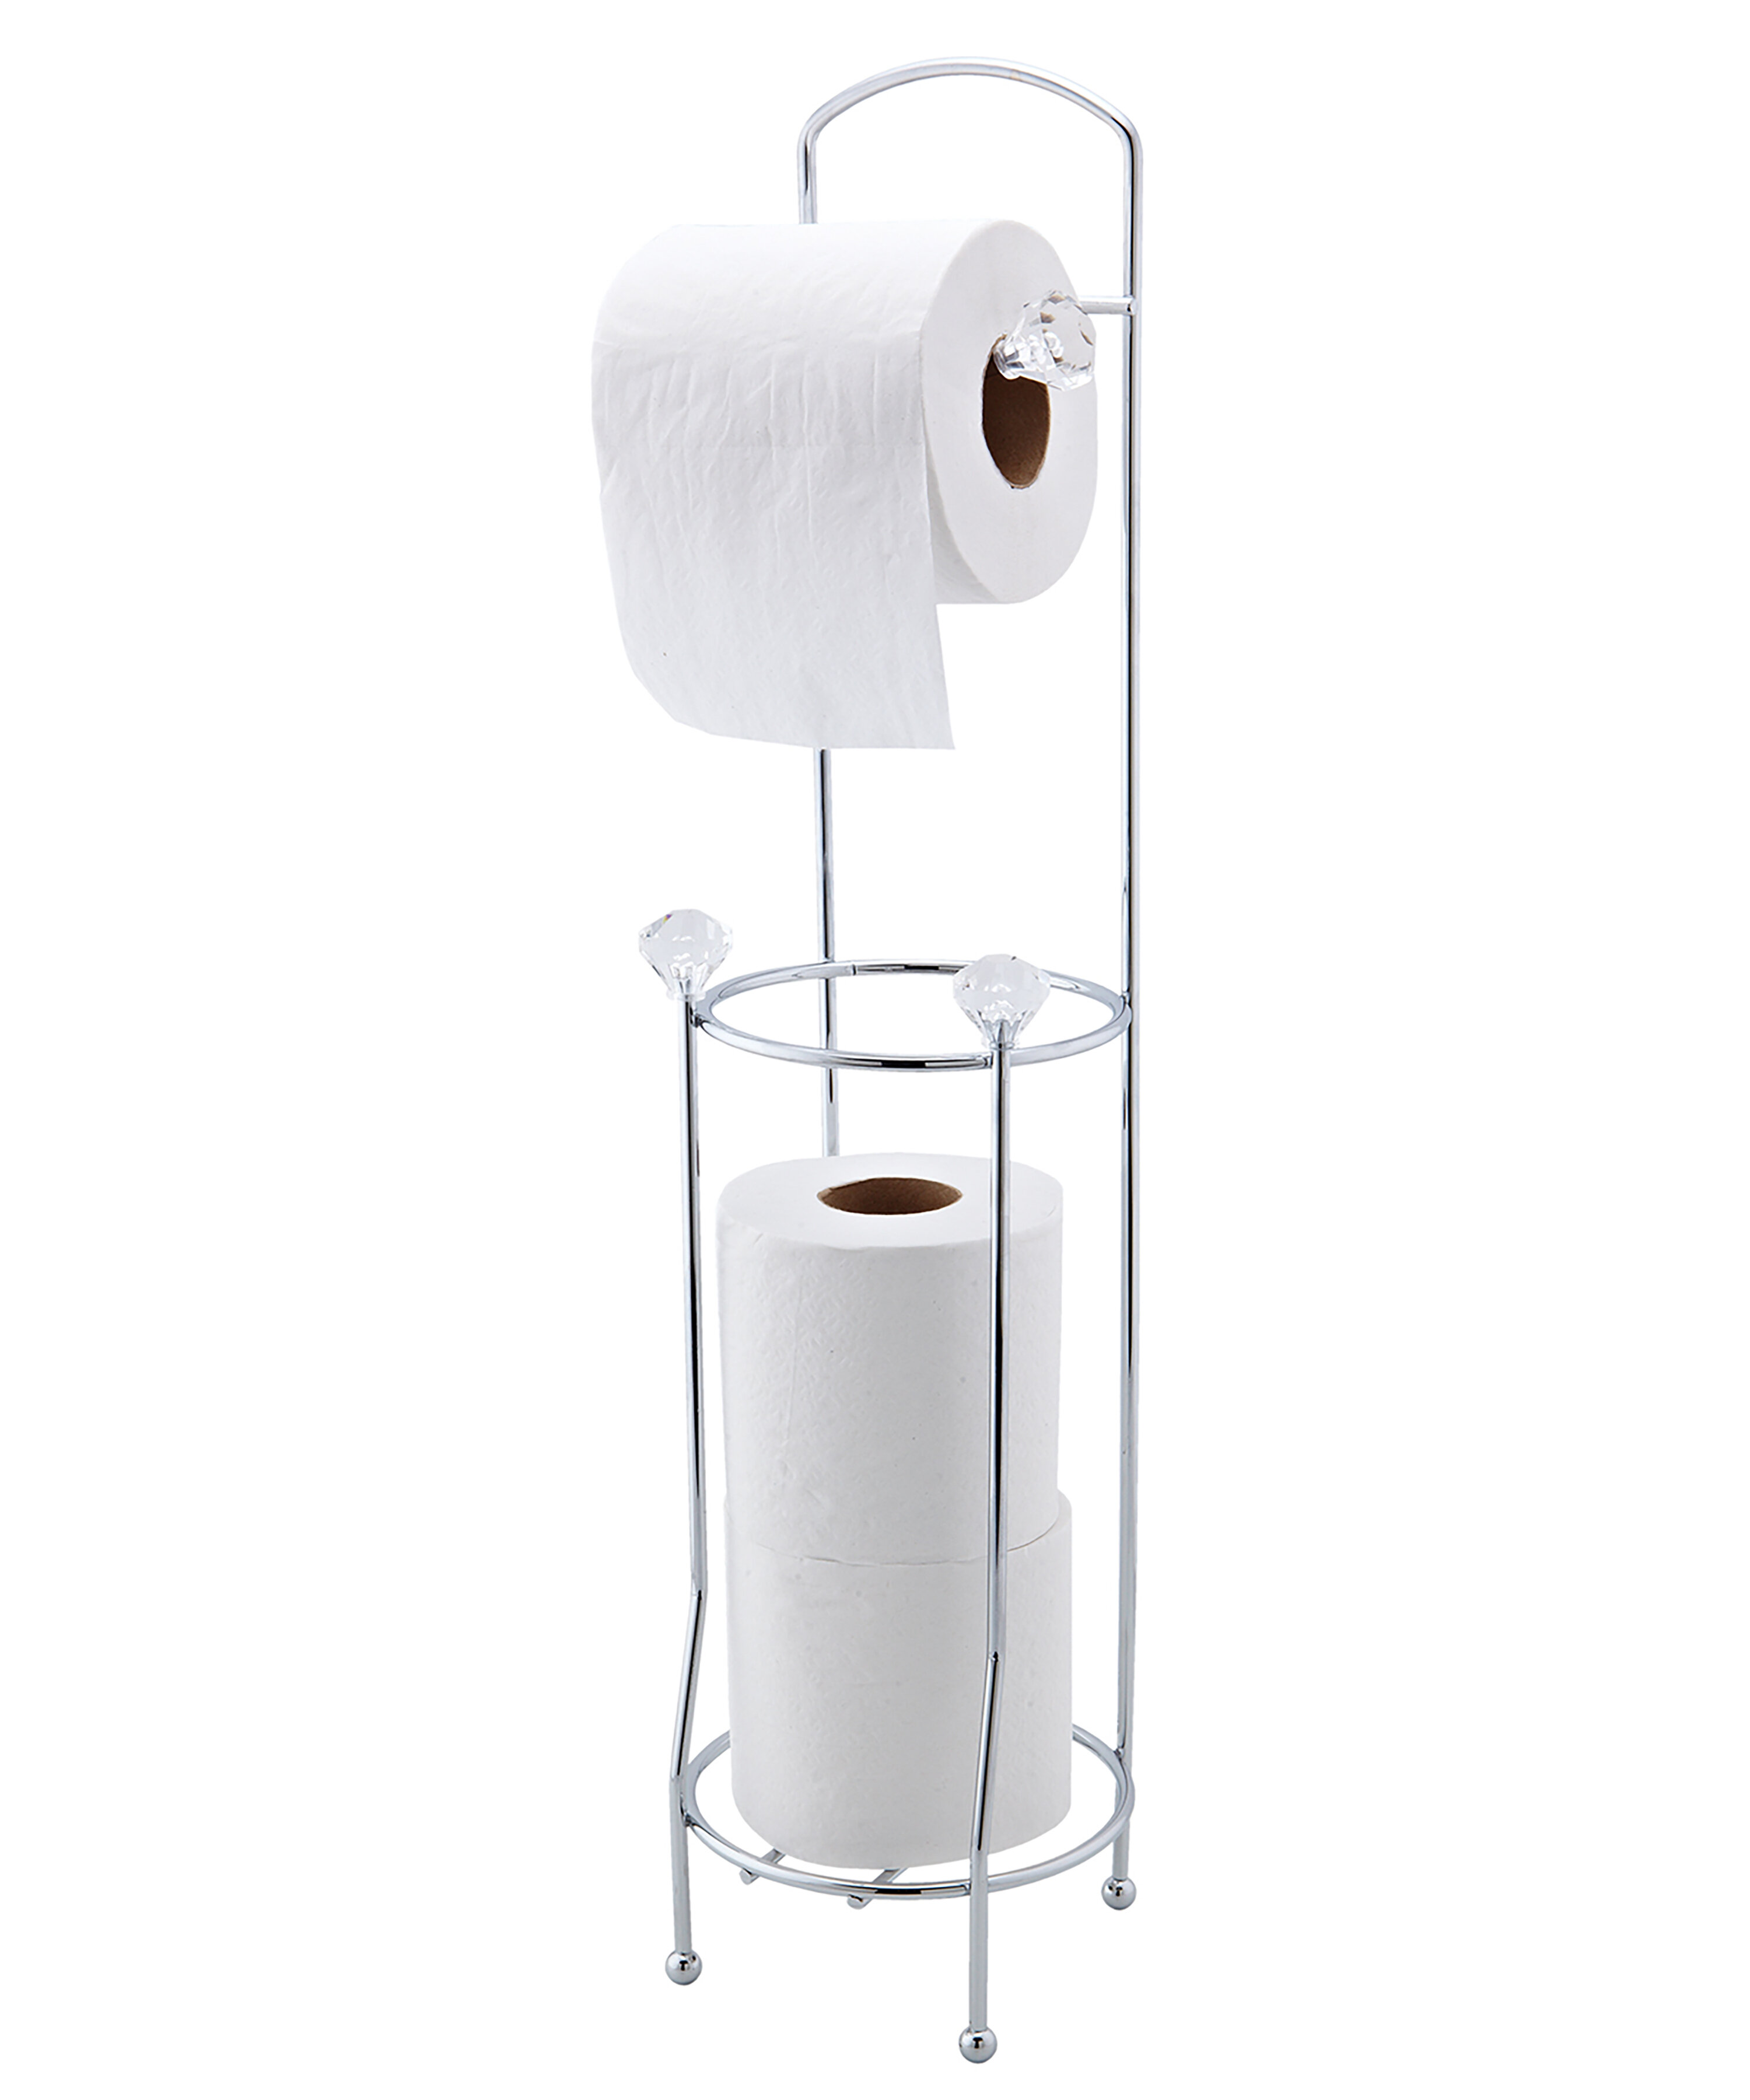 Bath Bliss Crystal Design Free Standing Toilet Paper Holder Reviews Wayfair Ca